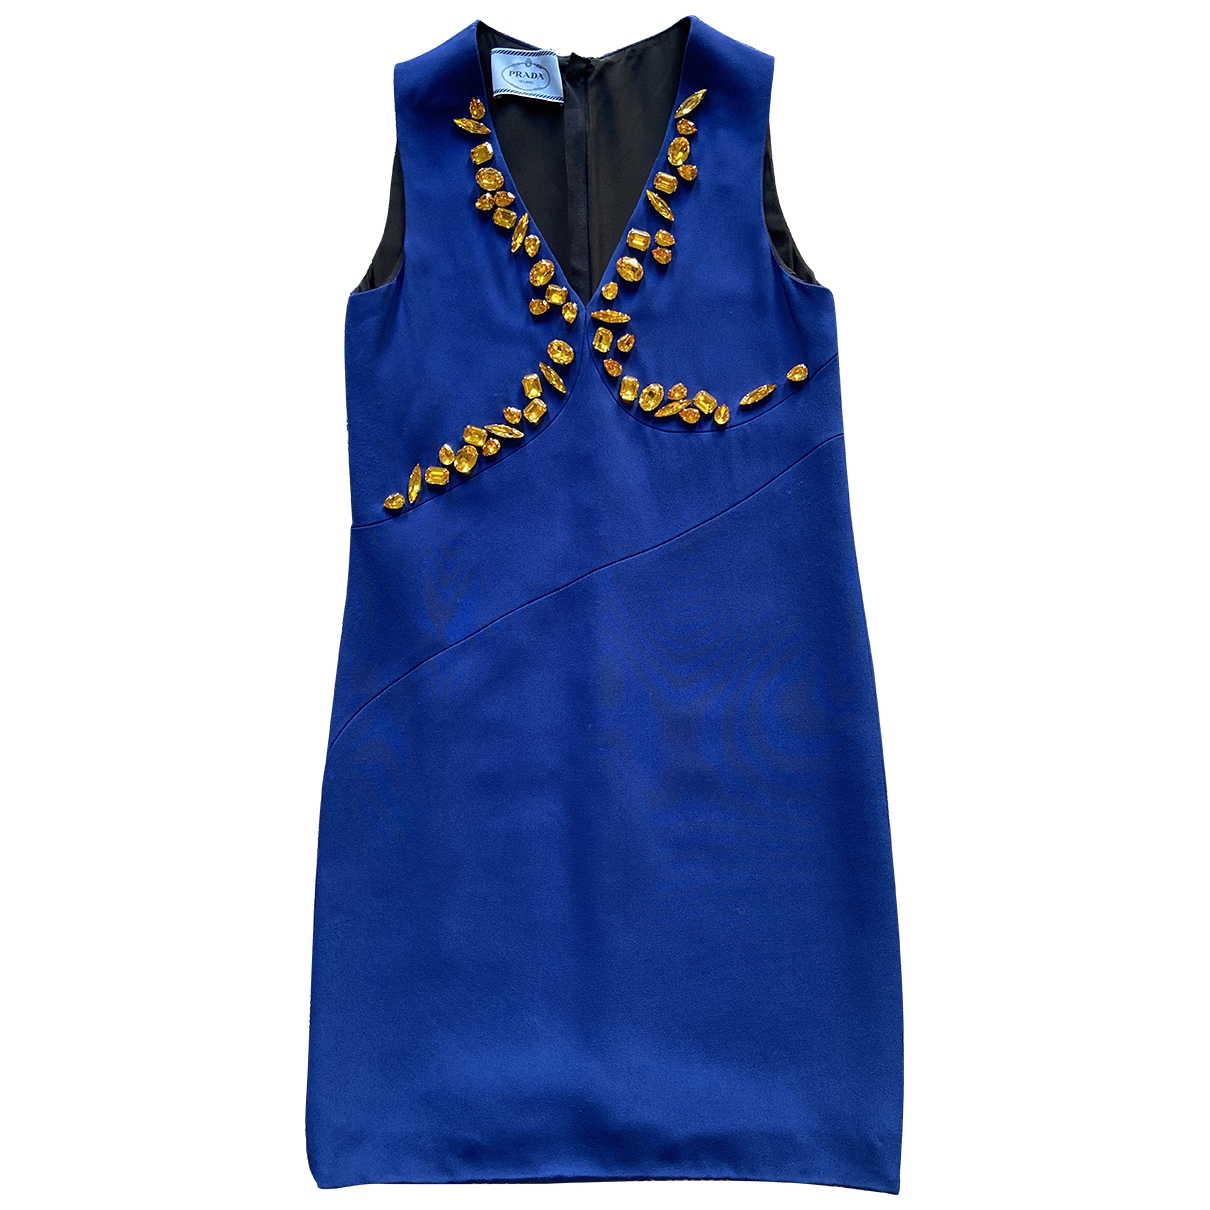 Prada \N Blue dress for Women 40 IT